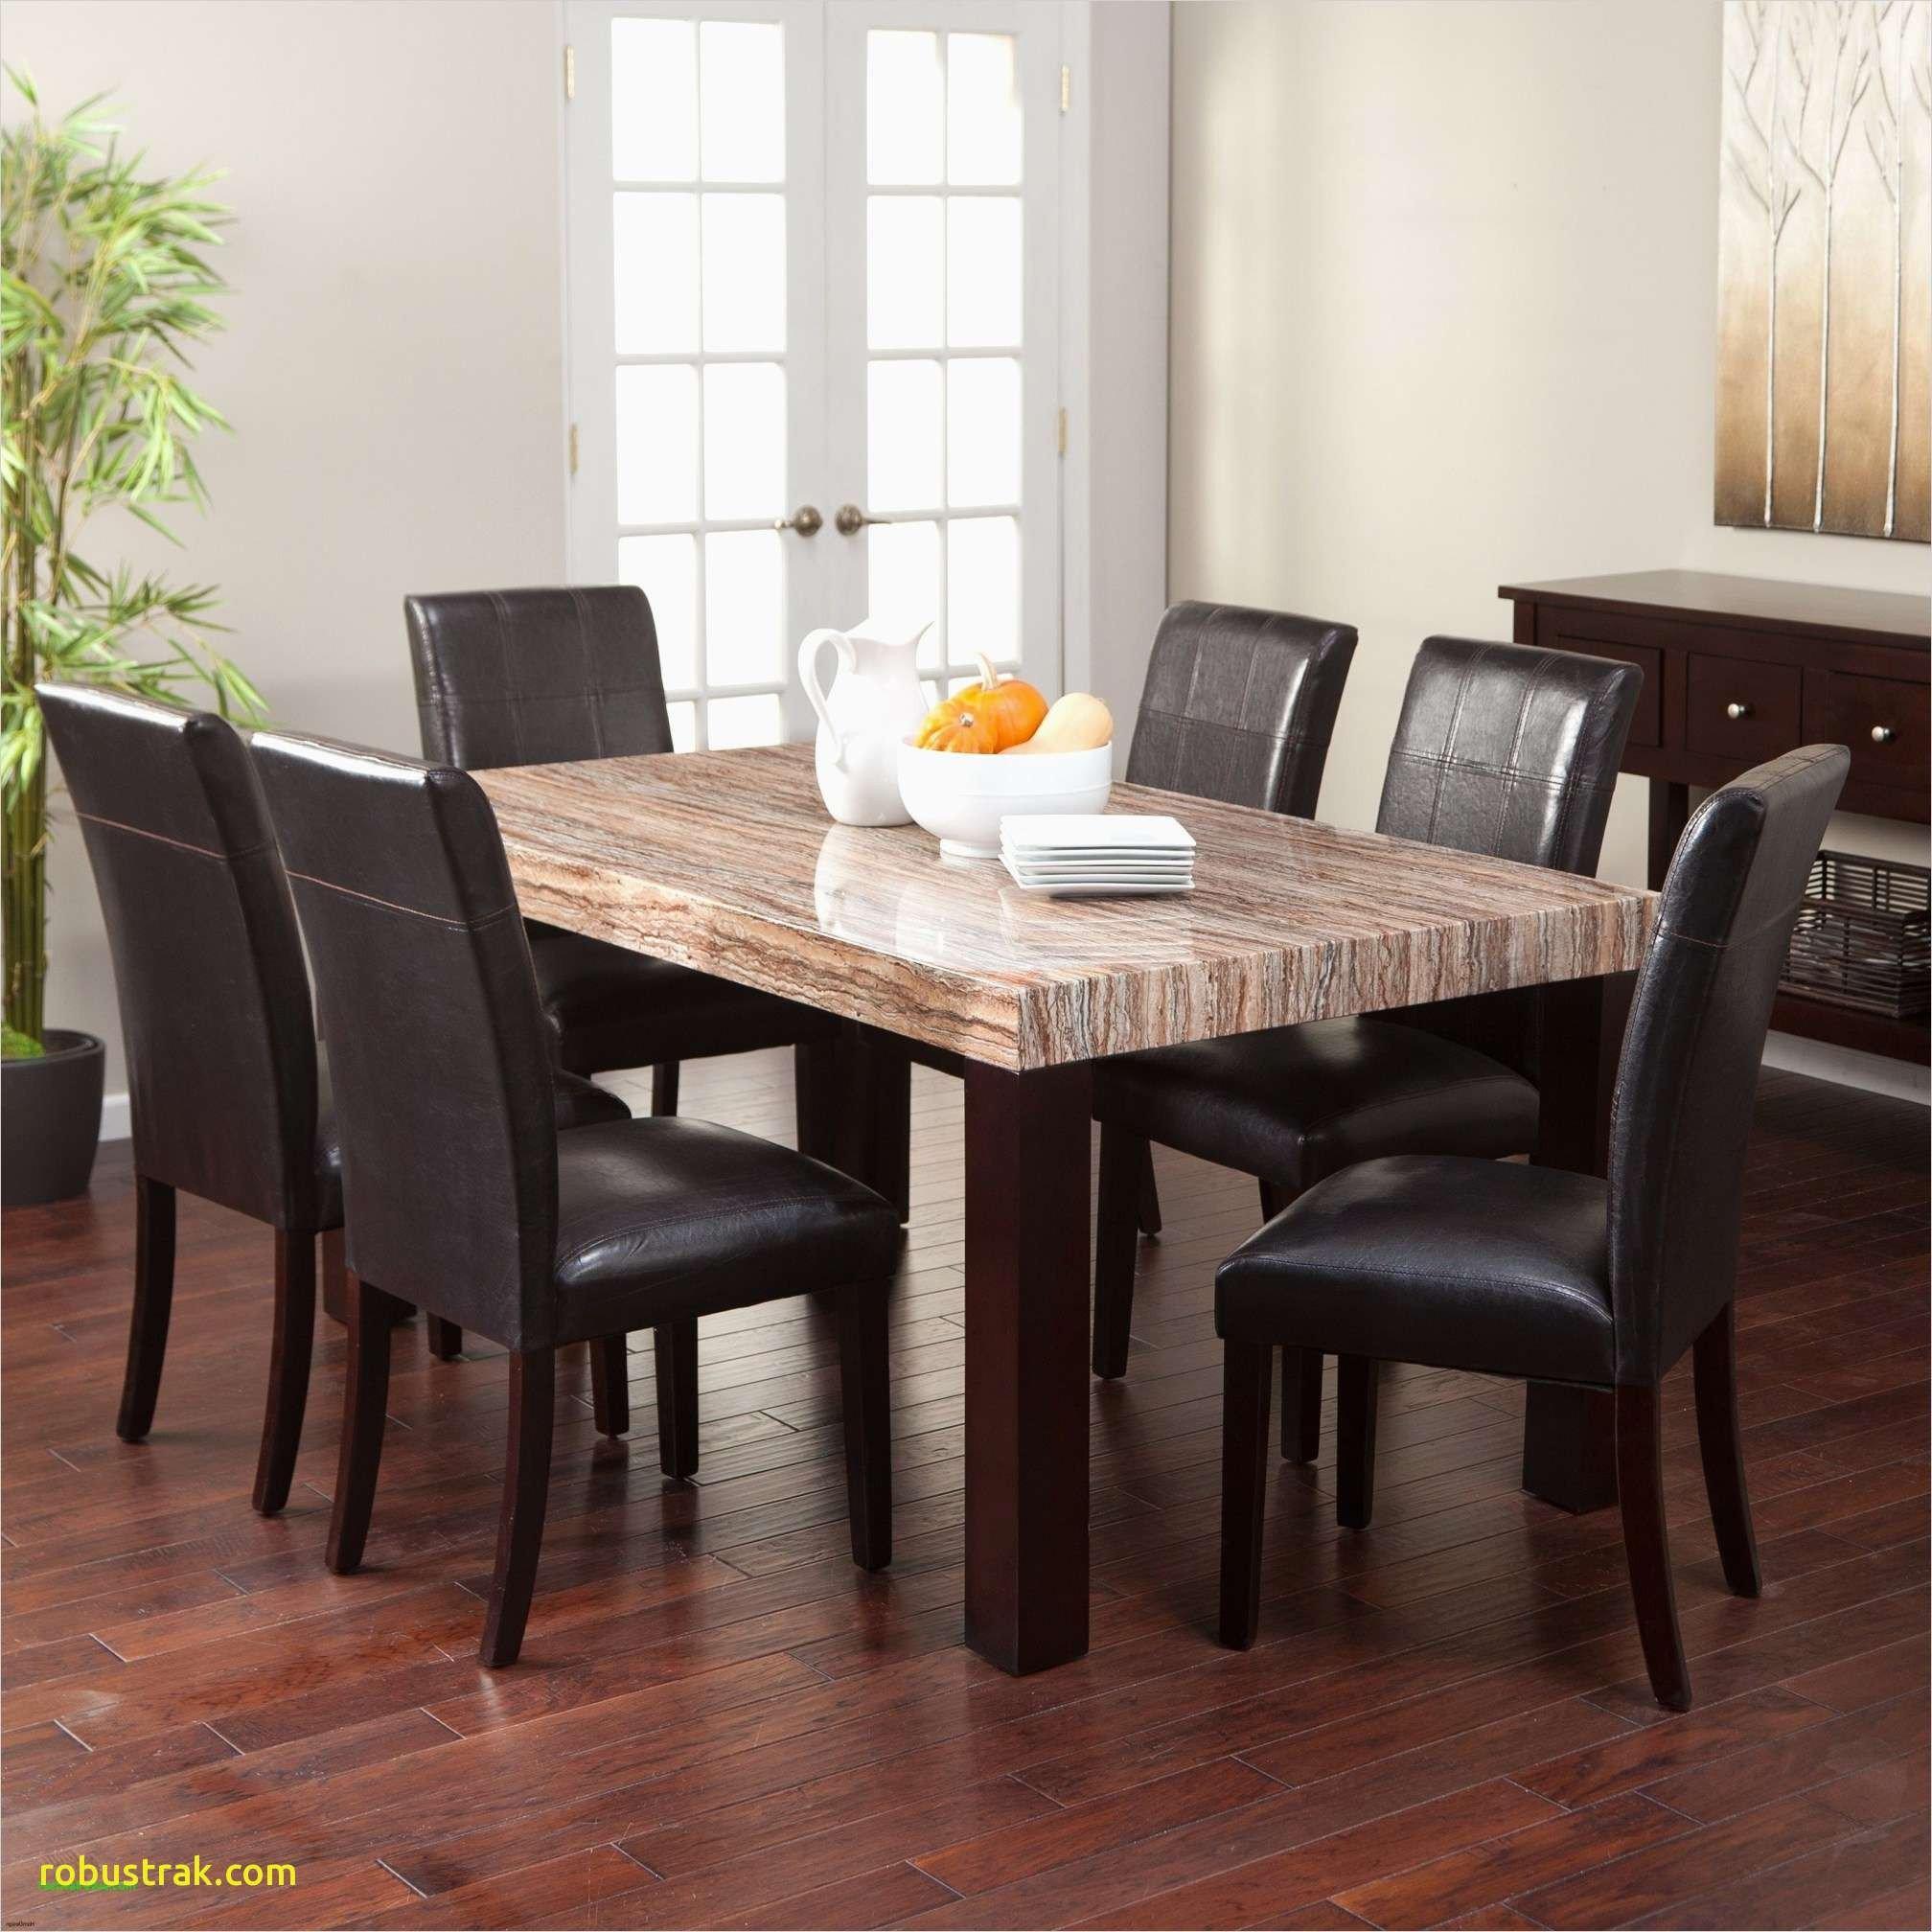 Bedroom Table and Chairs New 23 Popular Hardwood Floor Bedroom Rug